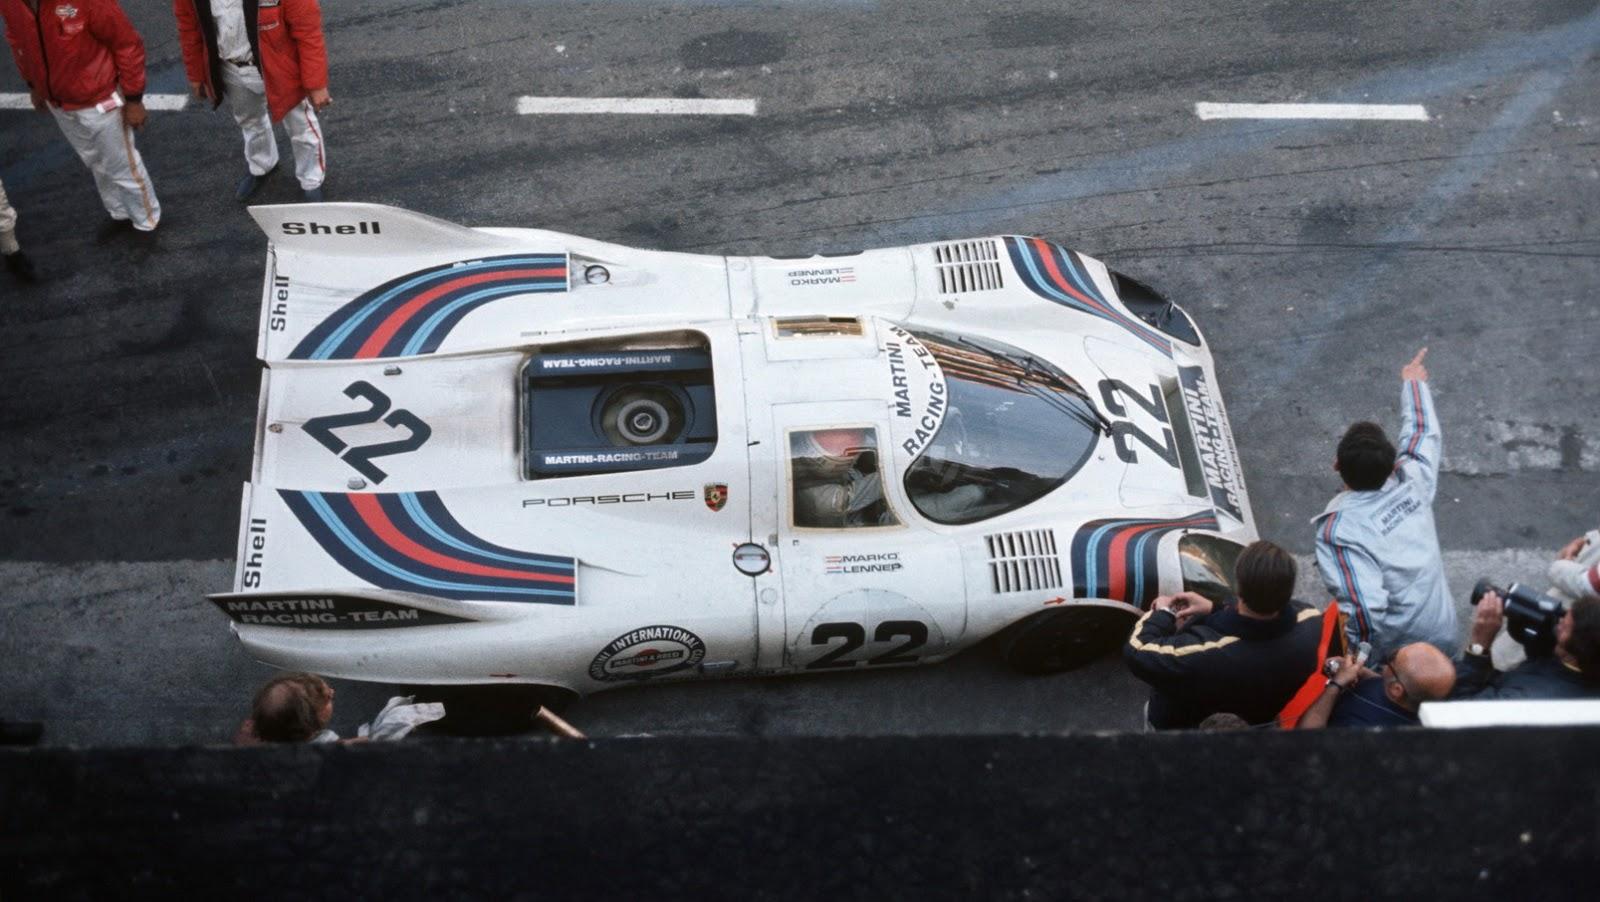 Porsche Macan Classic Racing Liveries (9)